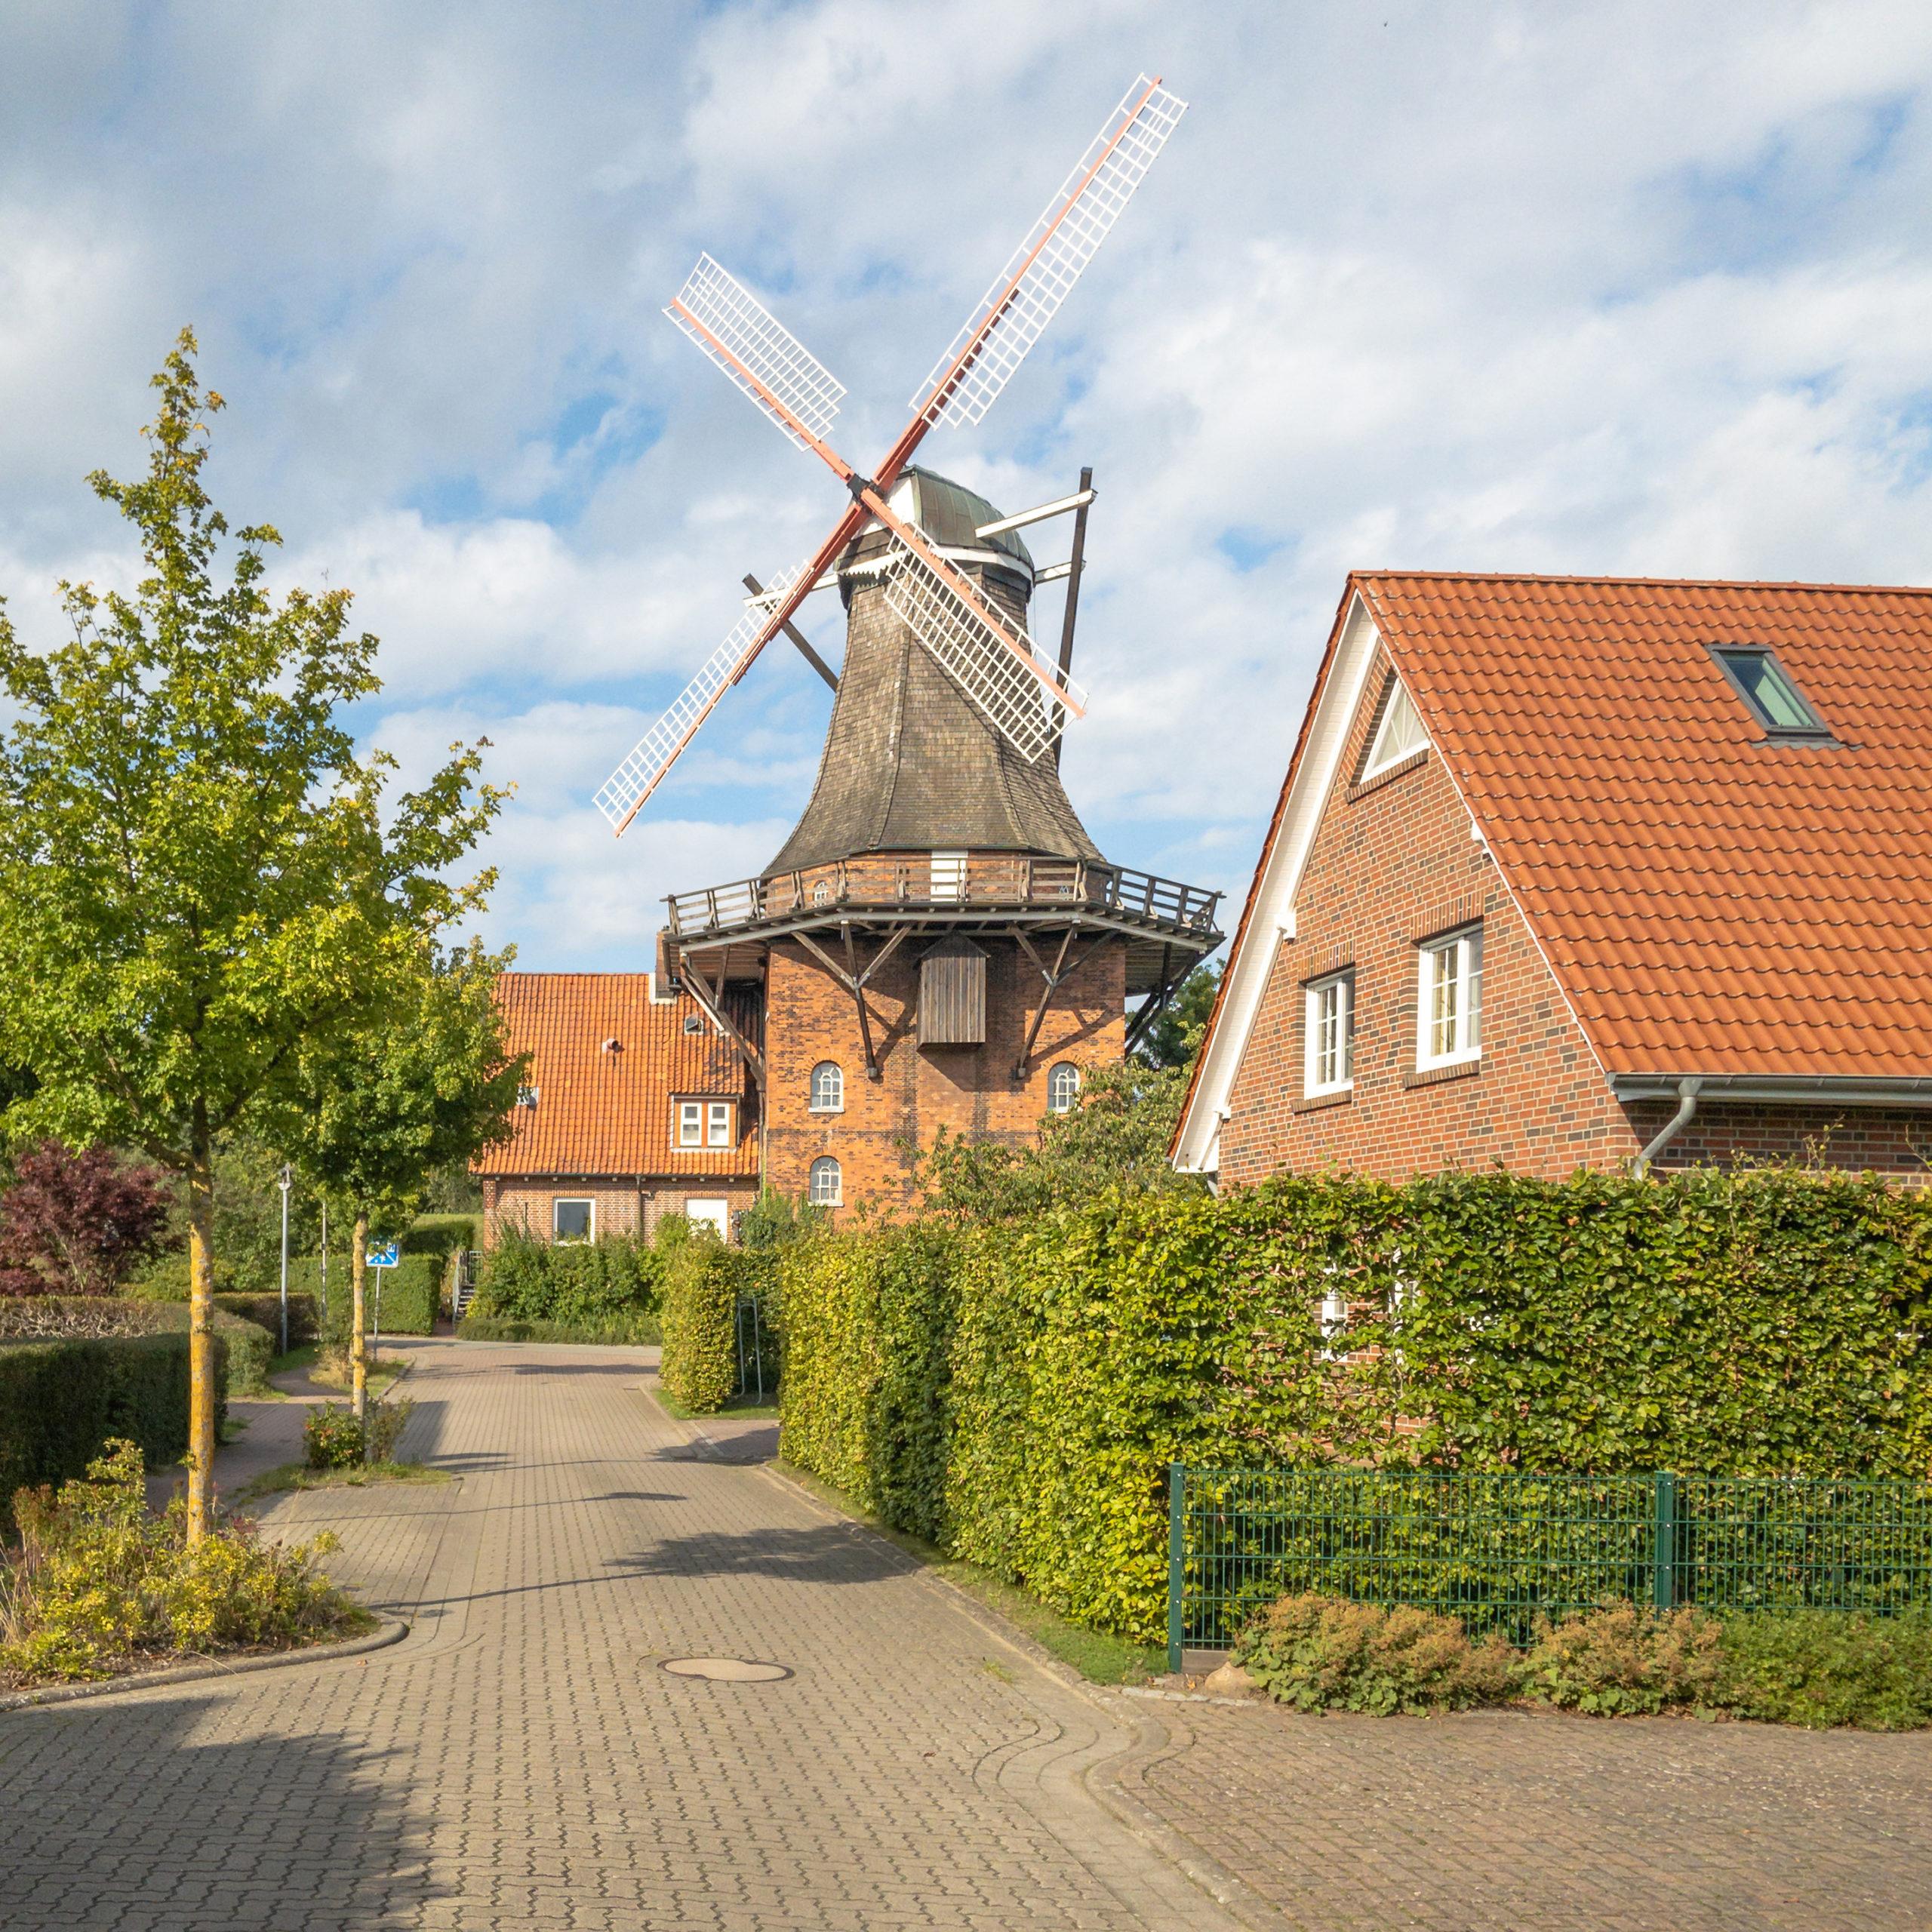 Windmühle Aurora, Jork, Altes Land